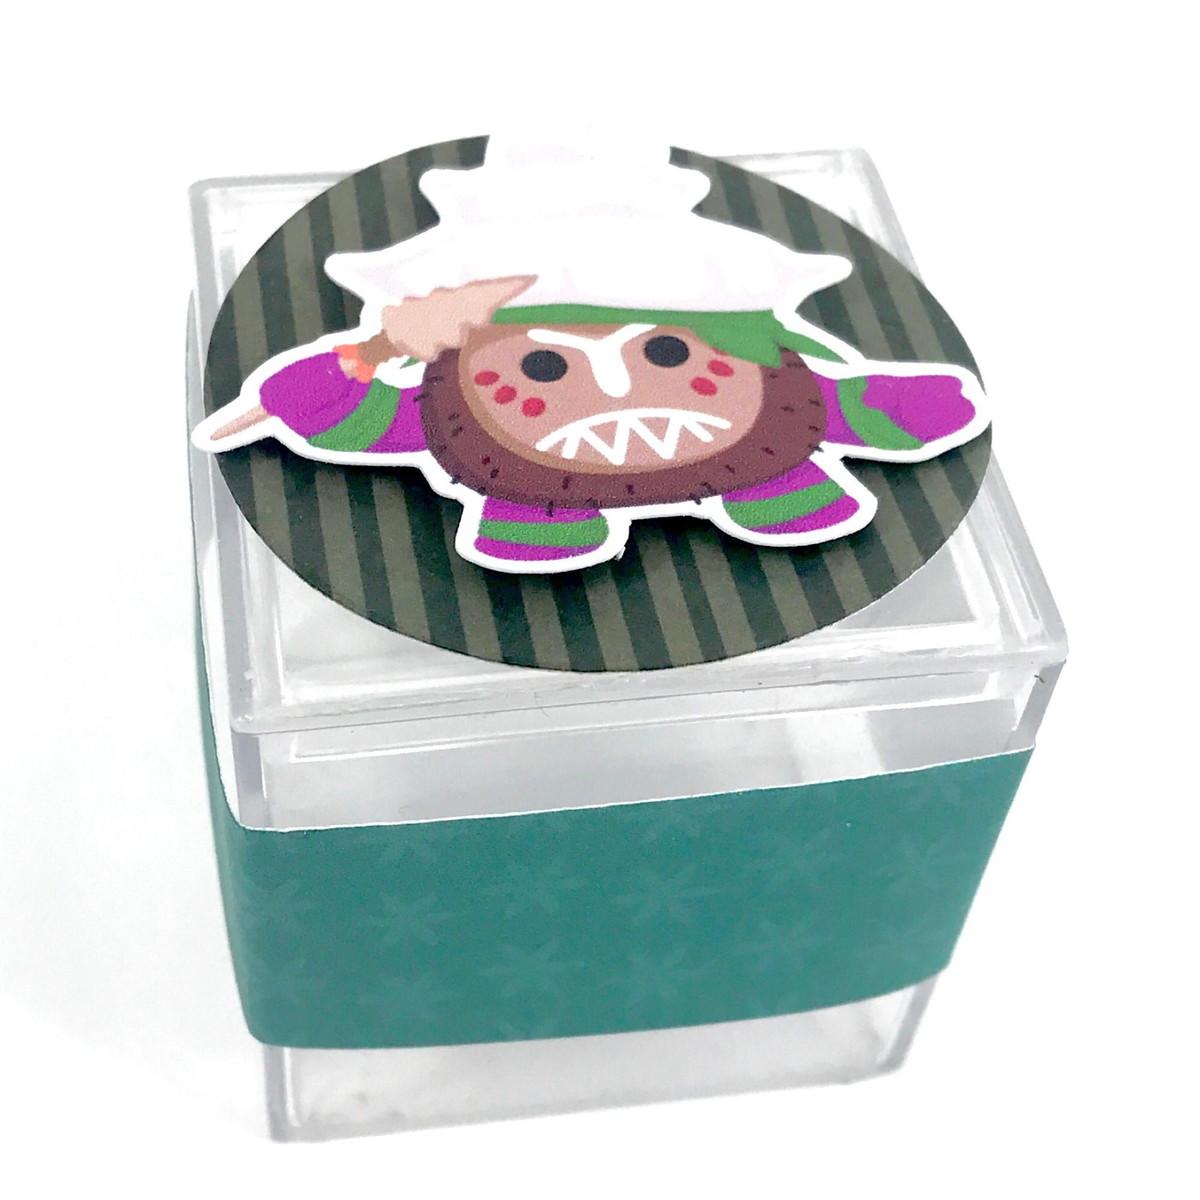 Caixinha Acrílico 3D - Moana  - Marina Levy Festas